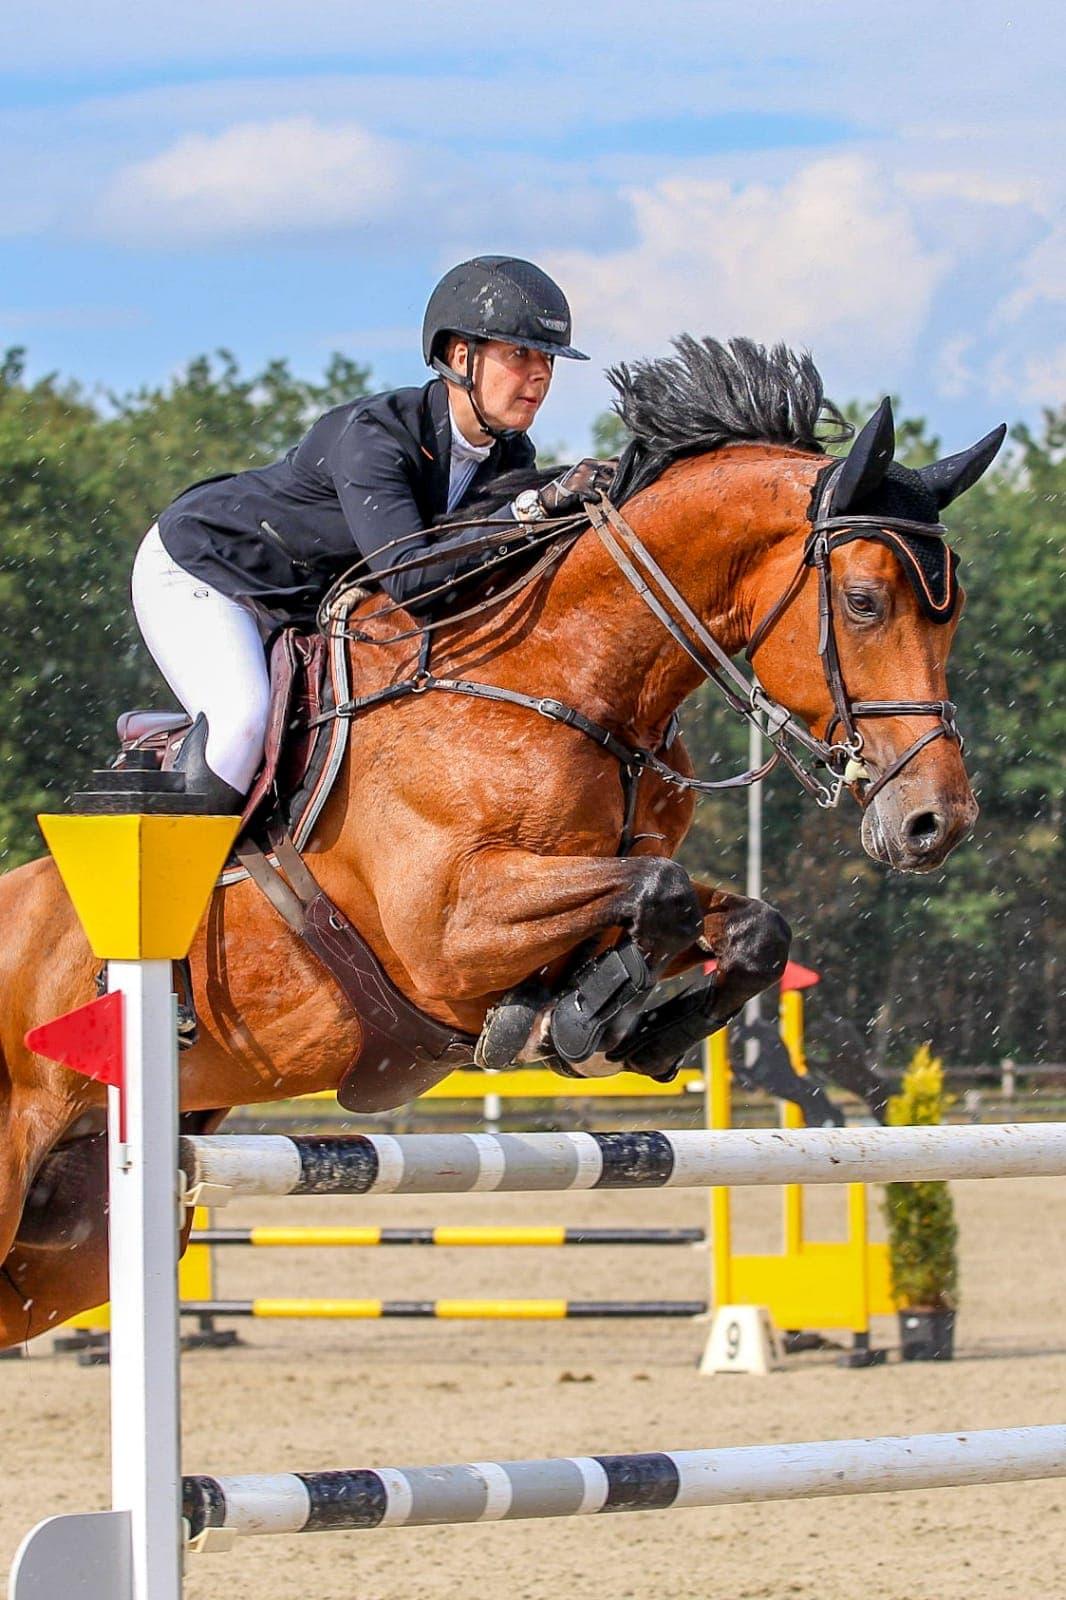 Fabienne Roelofsen naar Grand Prix winst in Zuidwolde